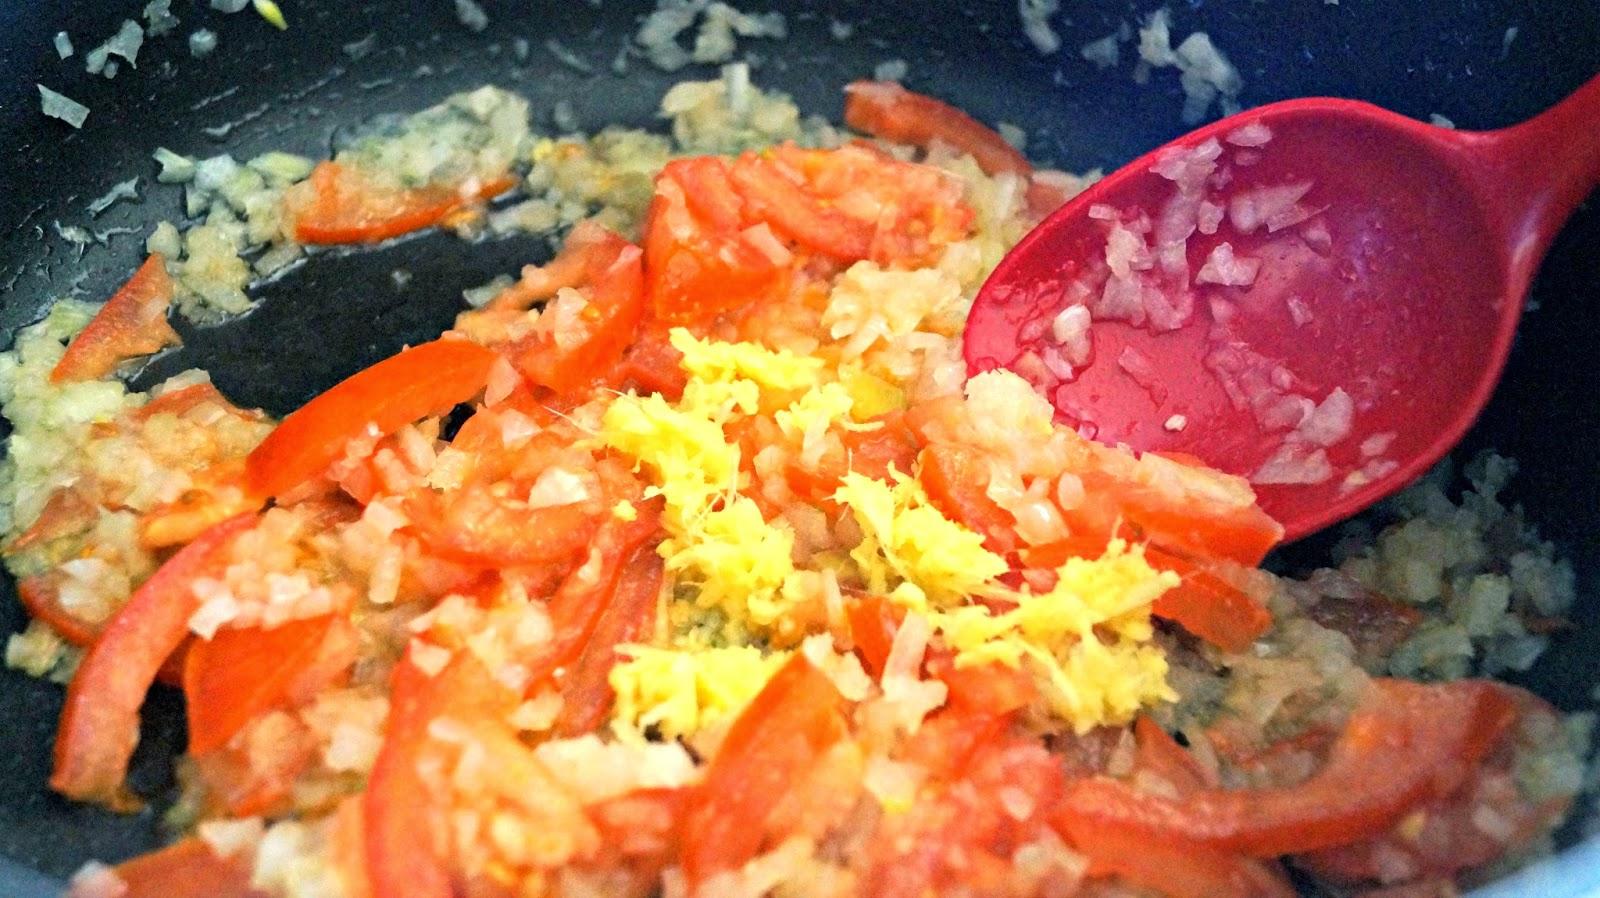 http://cupcakeluvs.blogspot.dk/2015/02/spicy-kylling-grn-bnner-lasagne-spicy.html